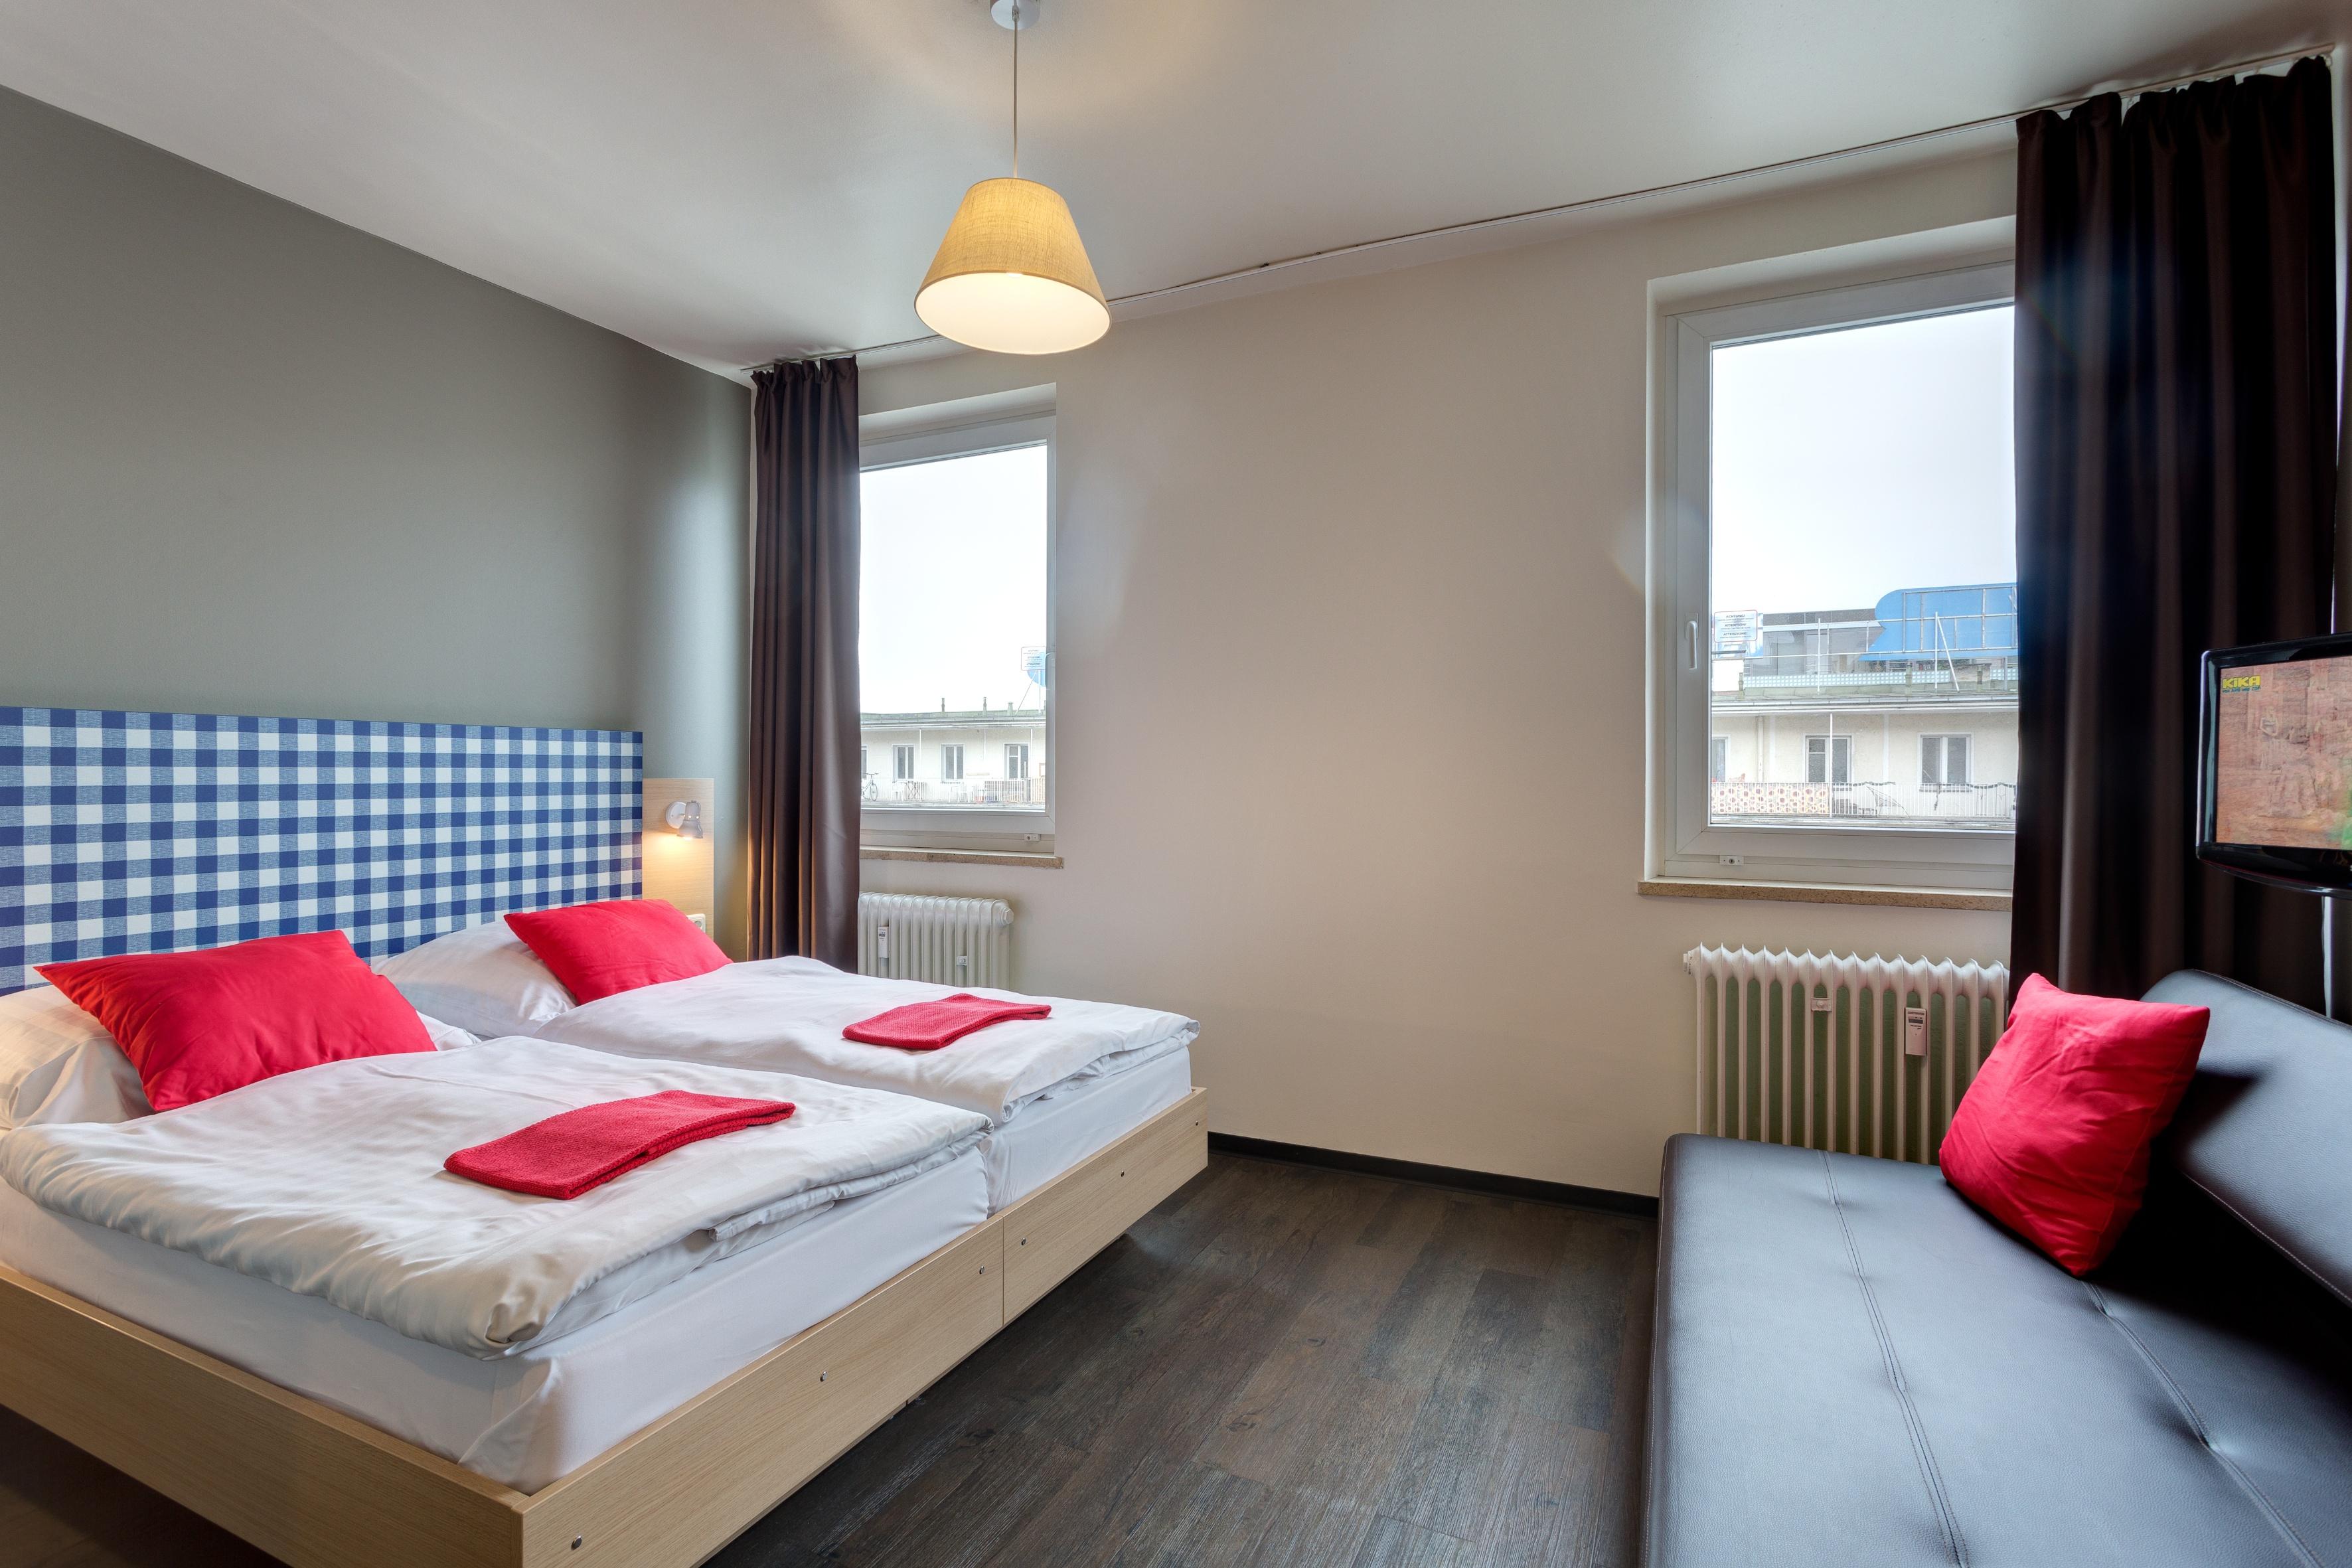 MEININGER Hotel Munich City Center - Habitación individual/doble